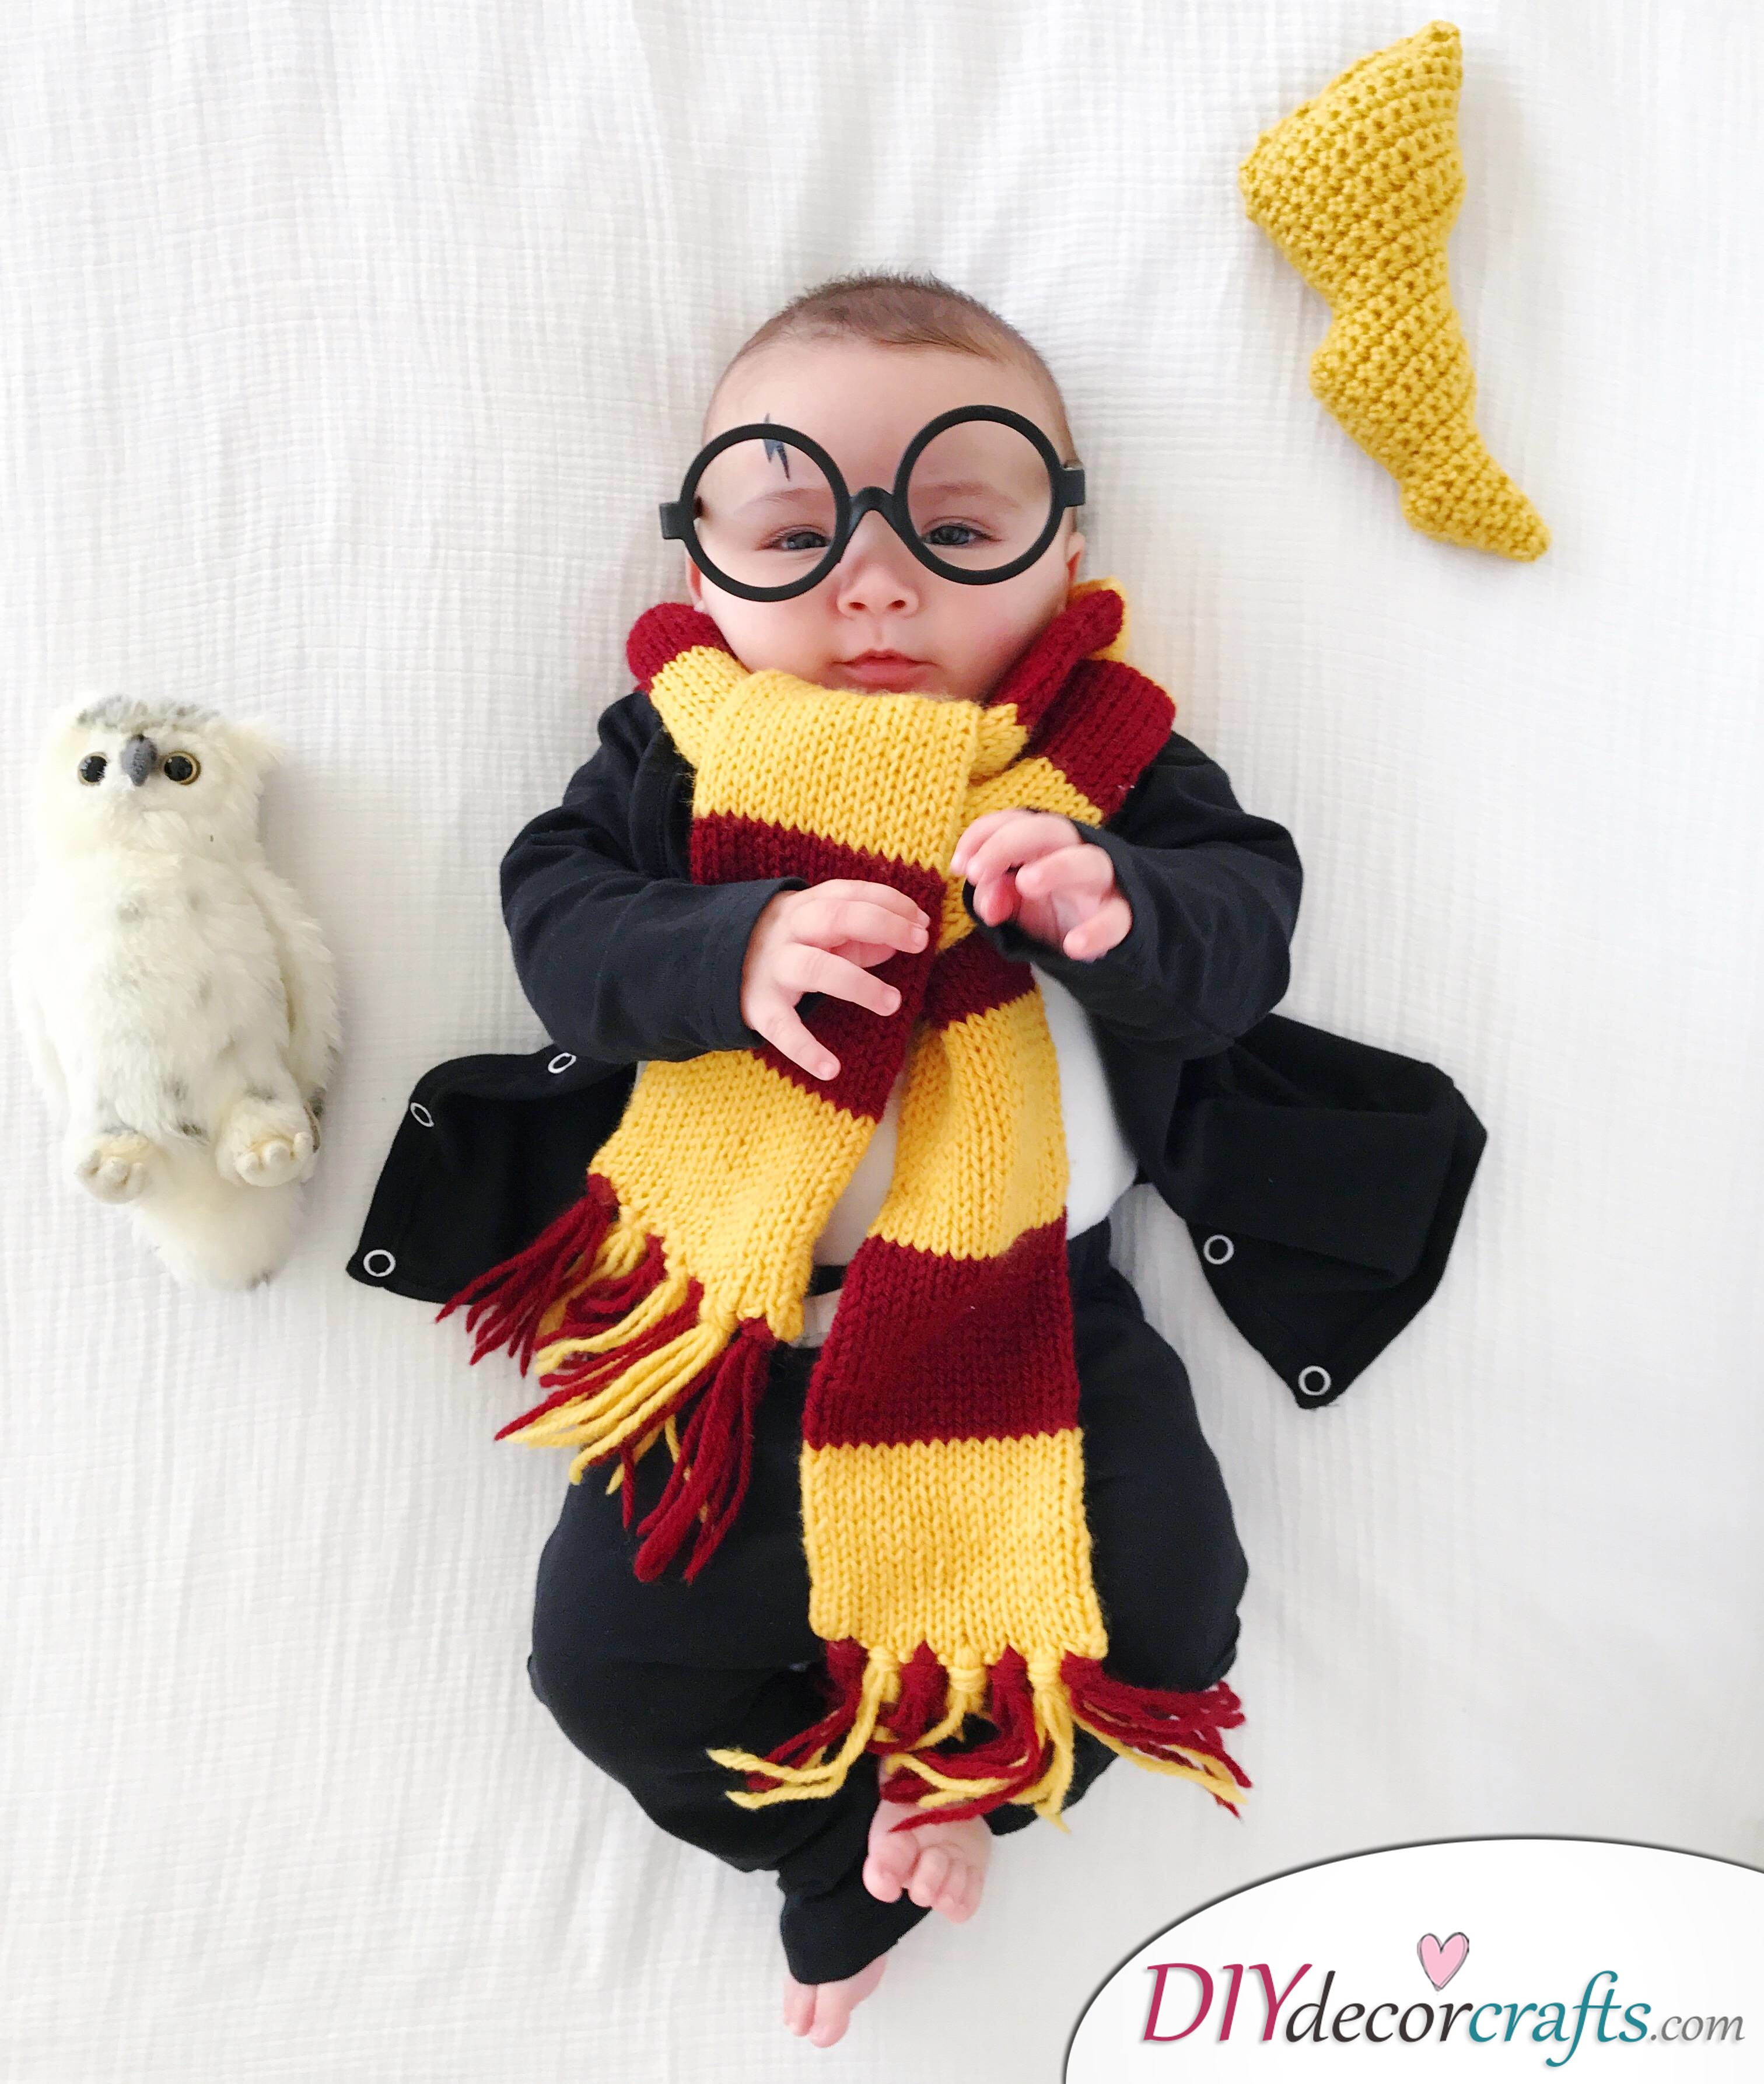 The Best DIY Halloween Costume Ideas For Kids, Baby Harry Potter